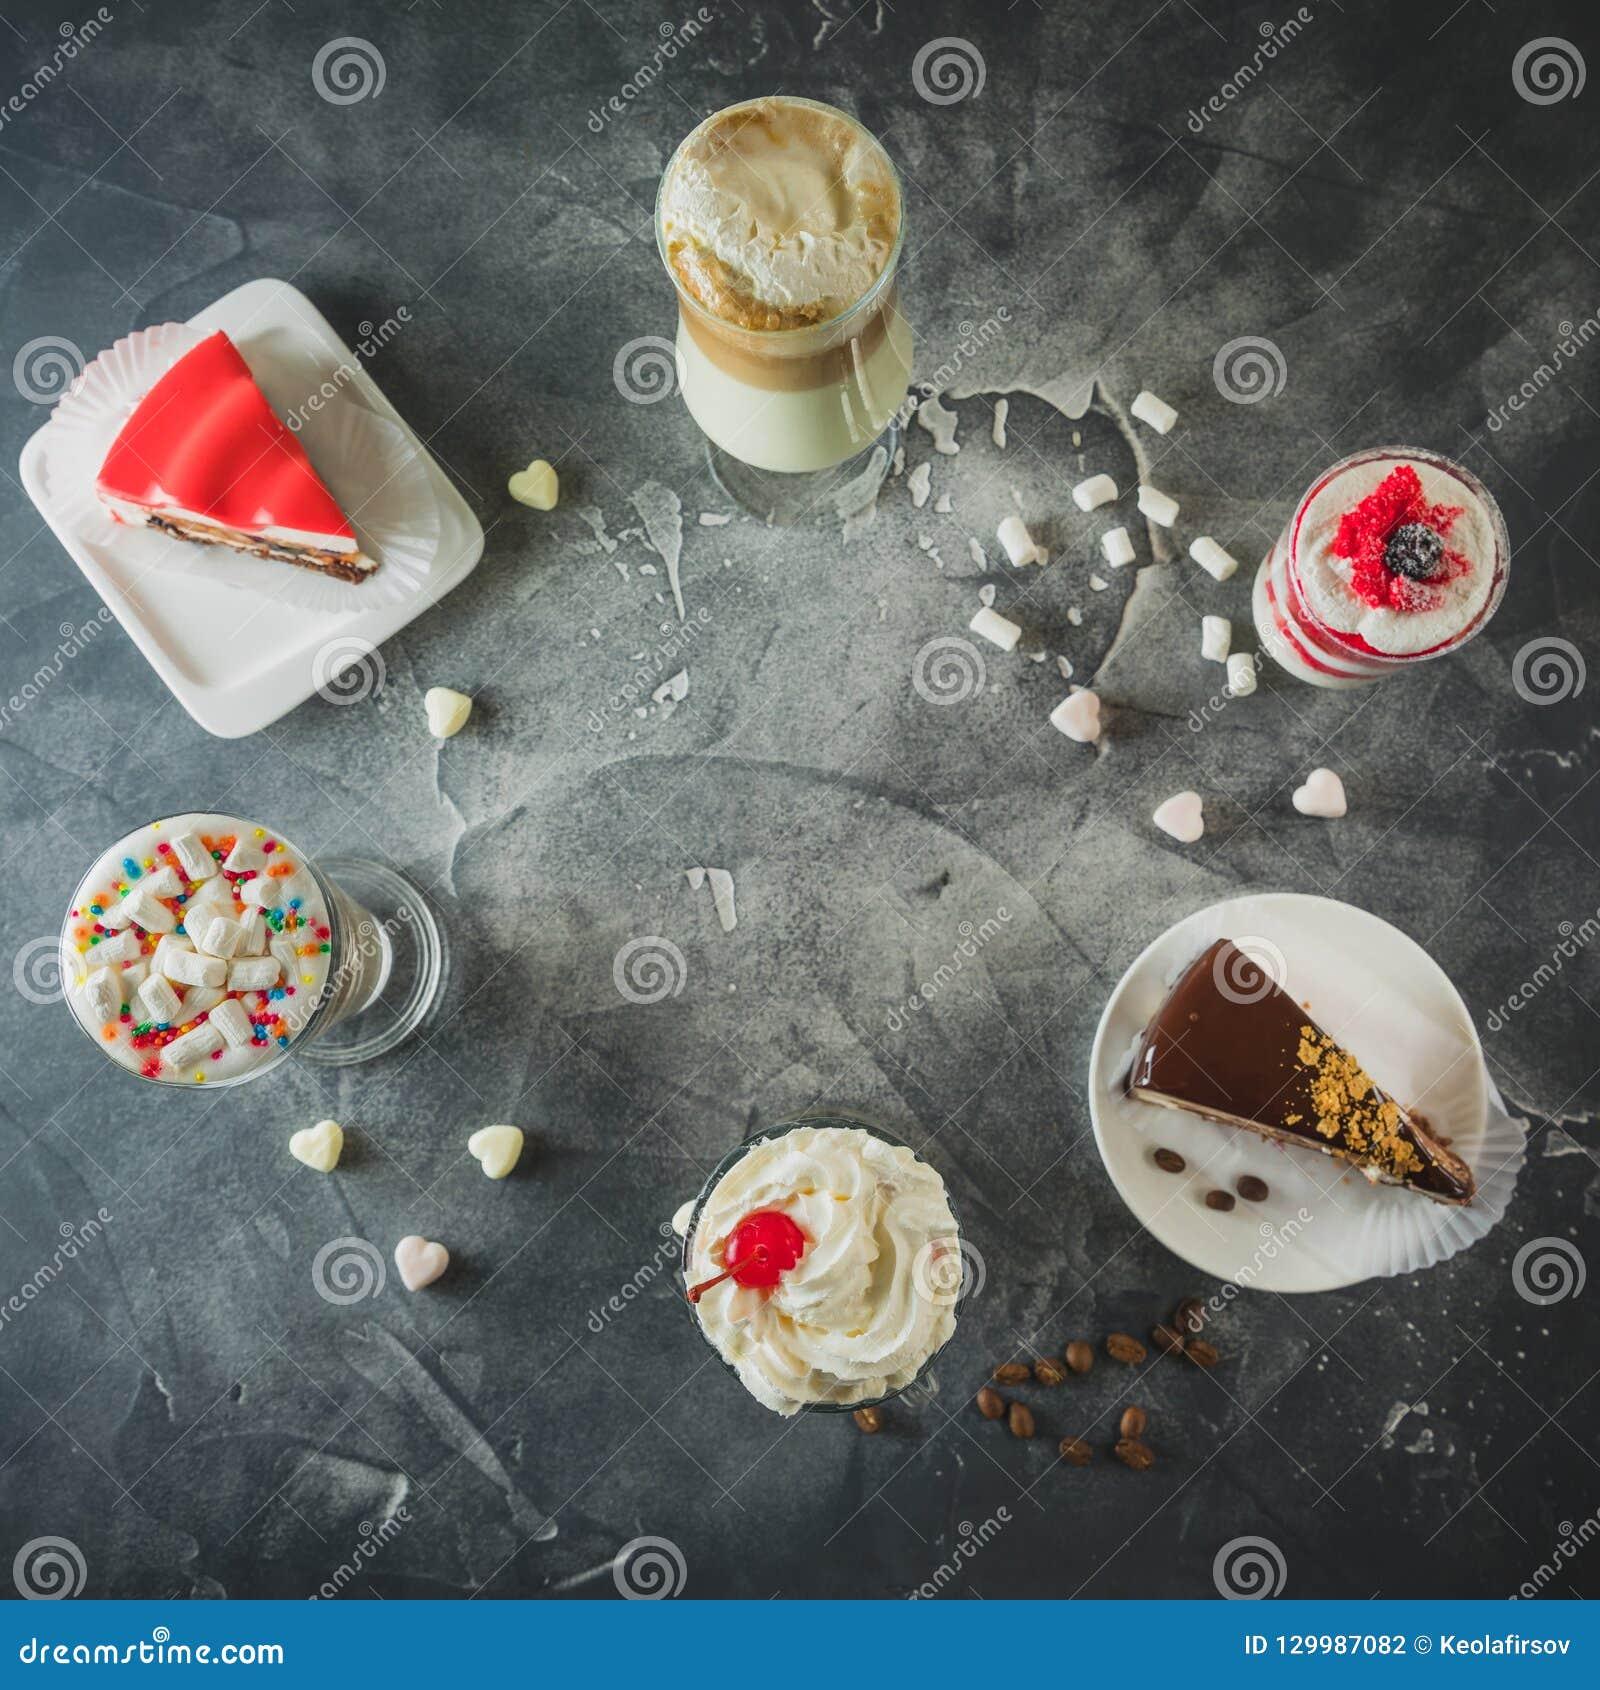 Food frame with milkshake drinks and desserts. Milkshakes and cake. Flat lay